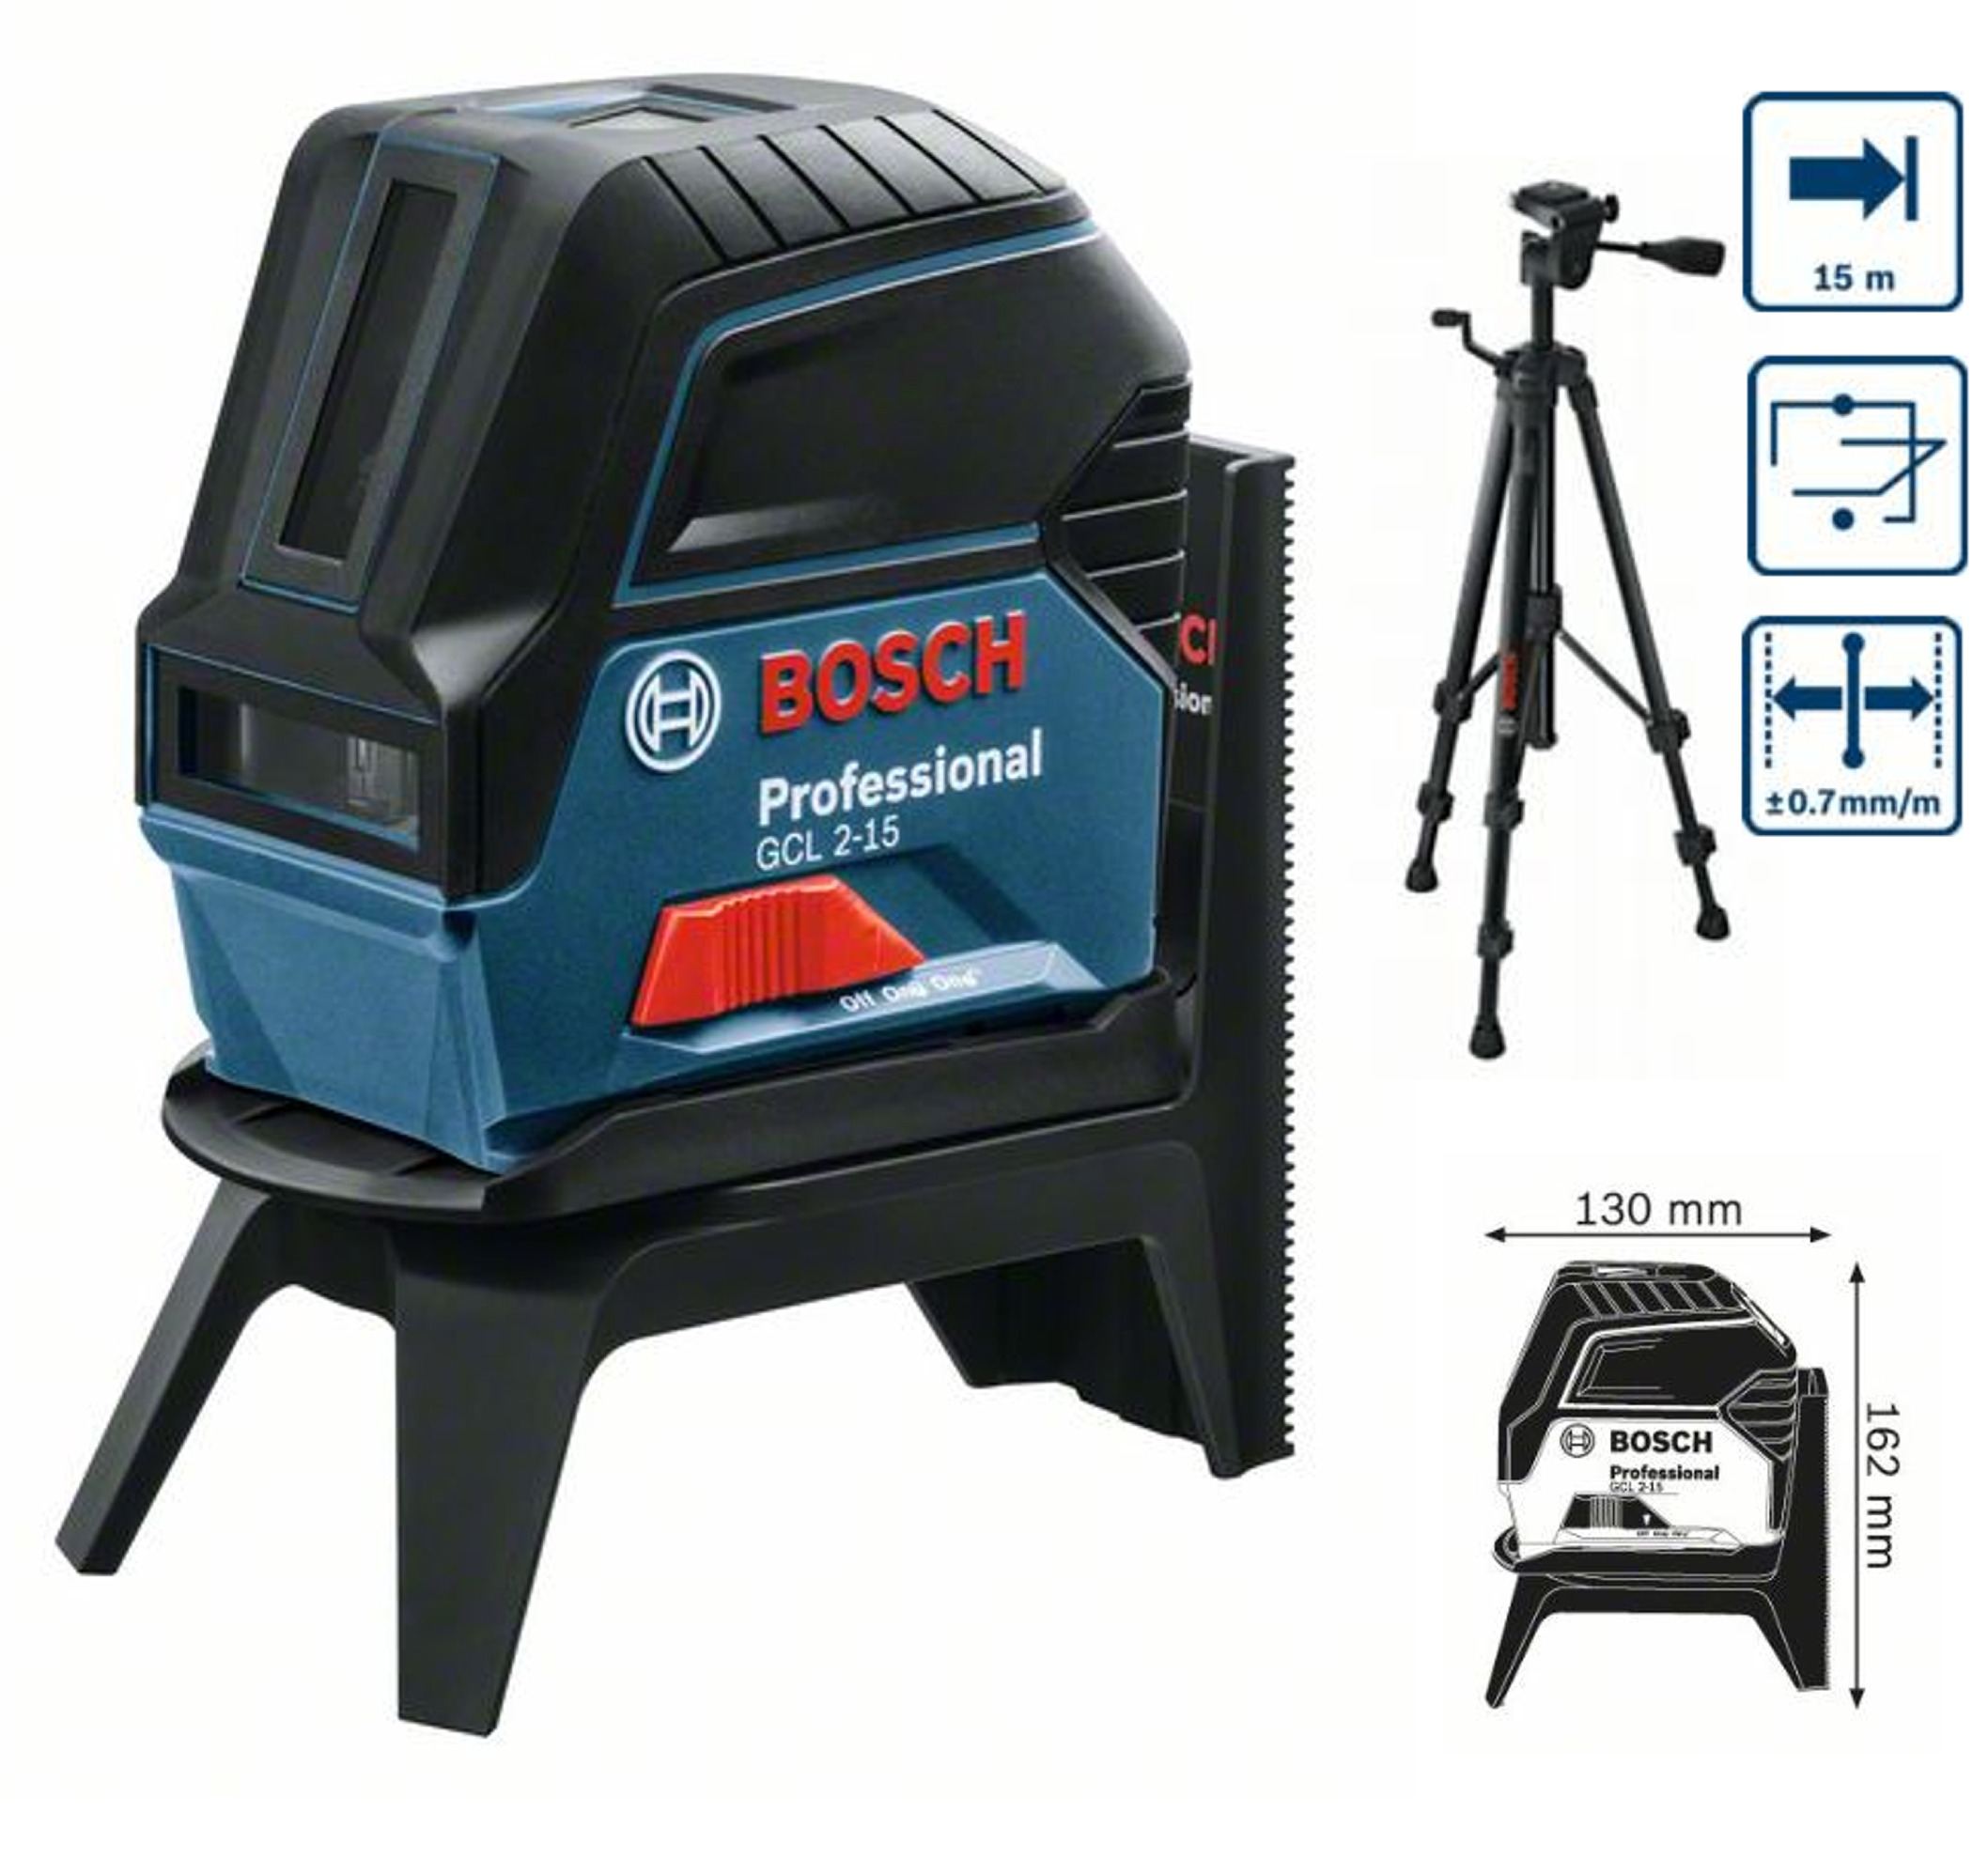 bosch bosch gcl 2 15 rm1 bt 150 kr ovo bodov laser fachman eh hobby s r o. Black Bedroom Furniture Sets. Home Design Ideas